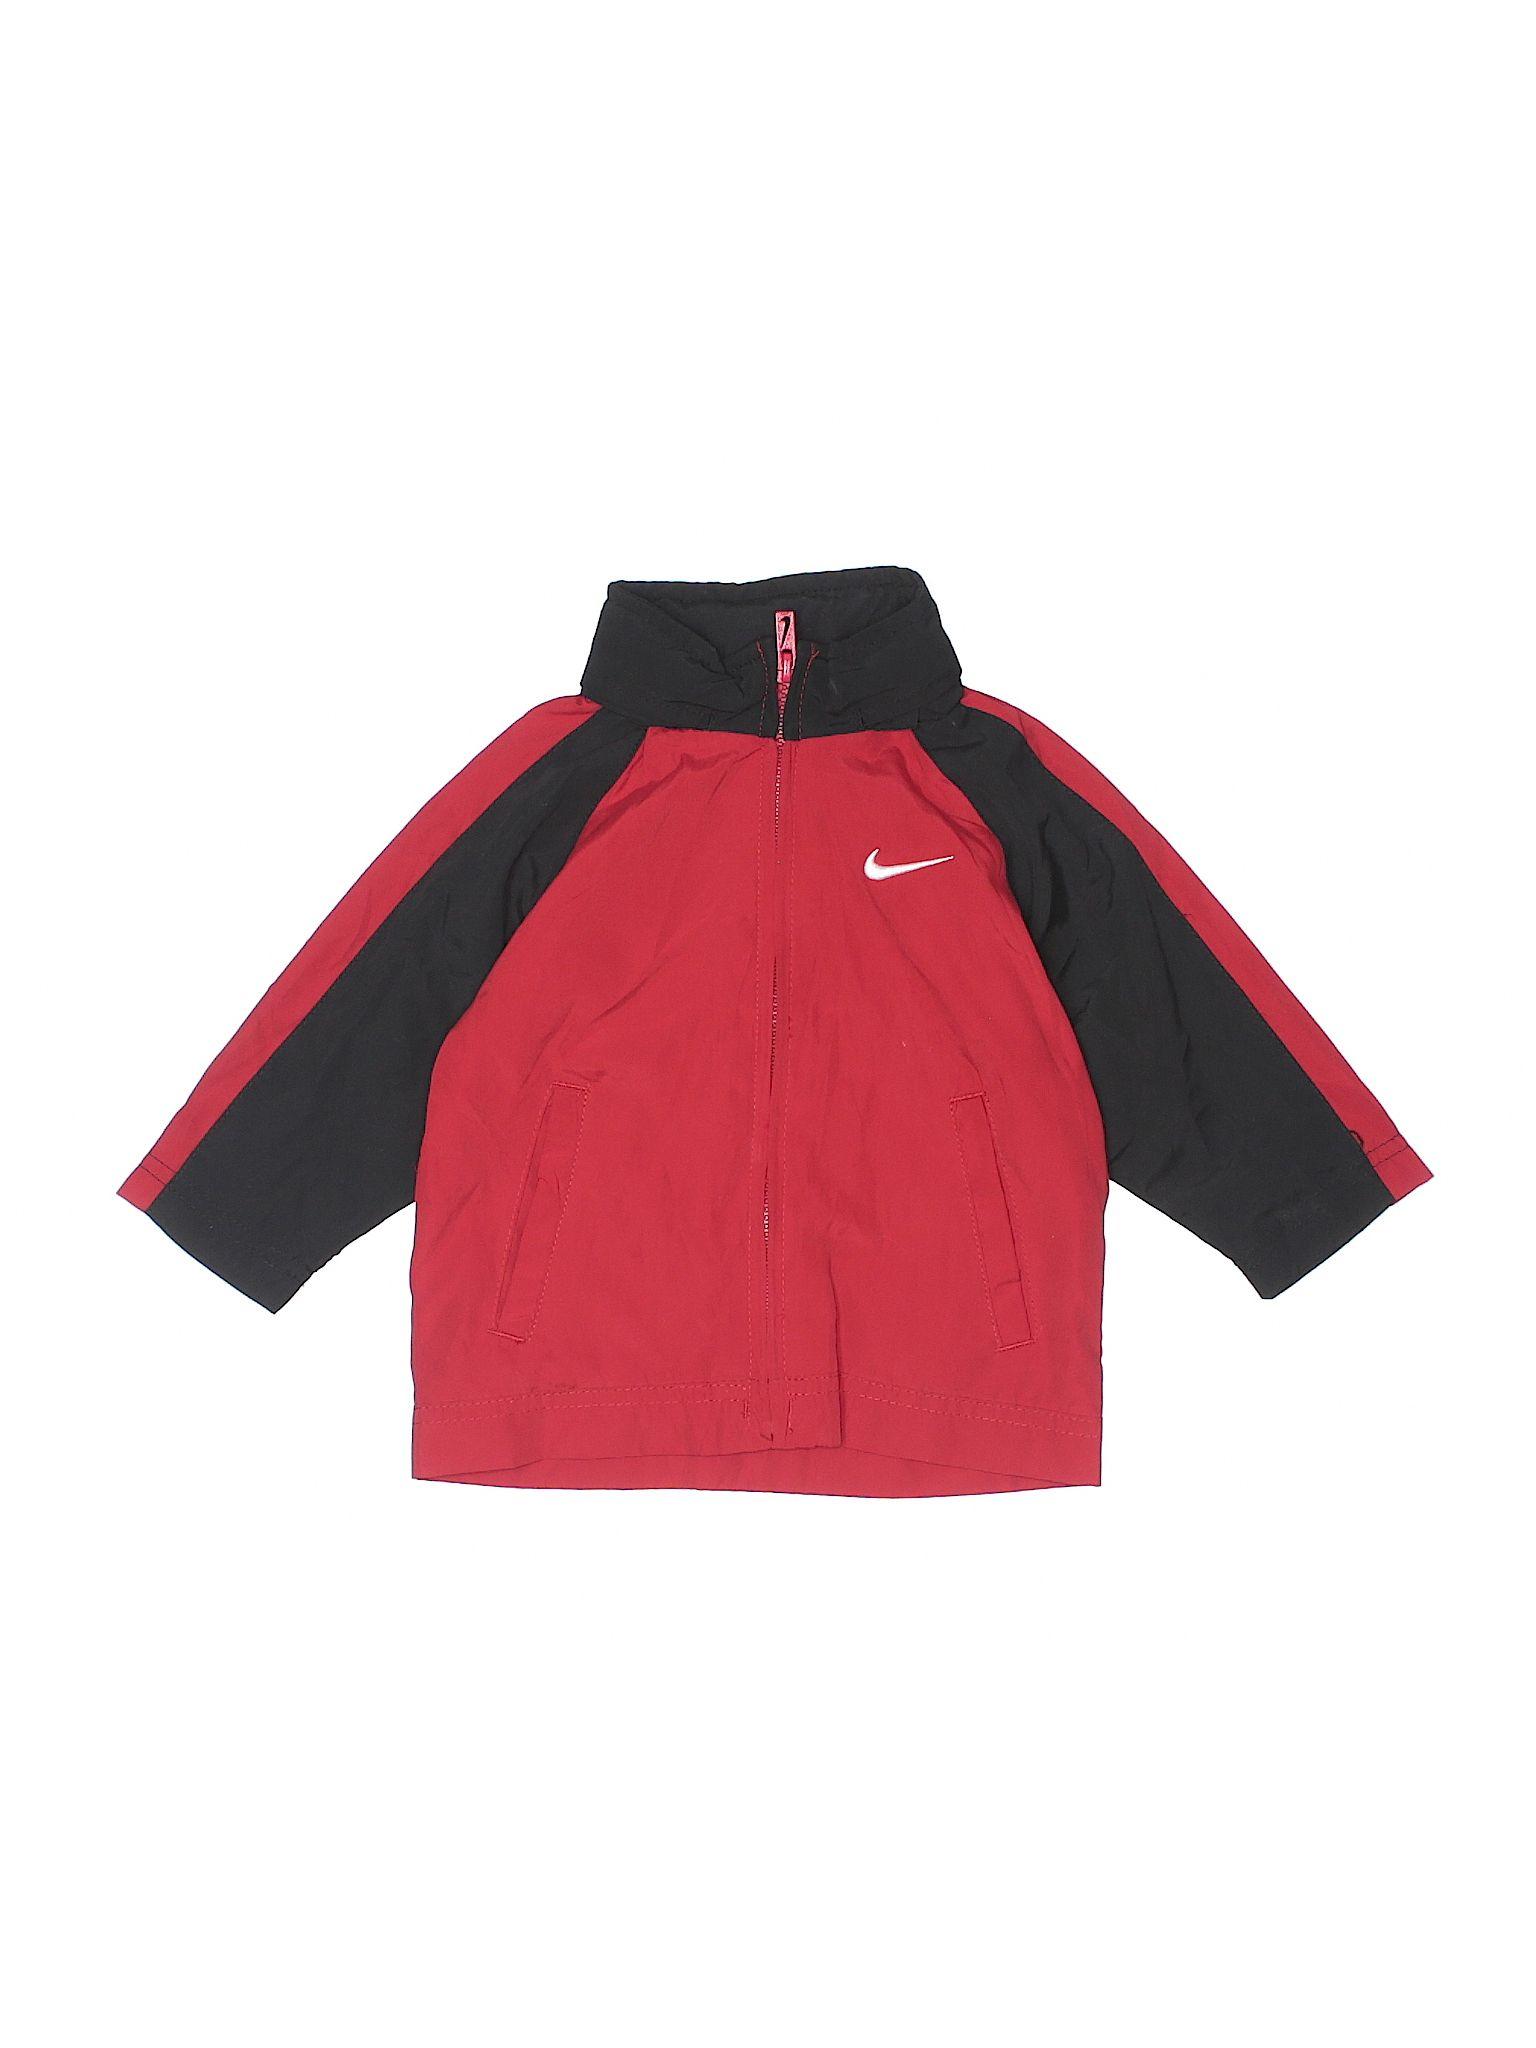 Denim Jacket Products Pinterest Denim Jackets And Red Denim